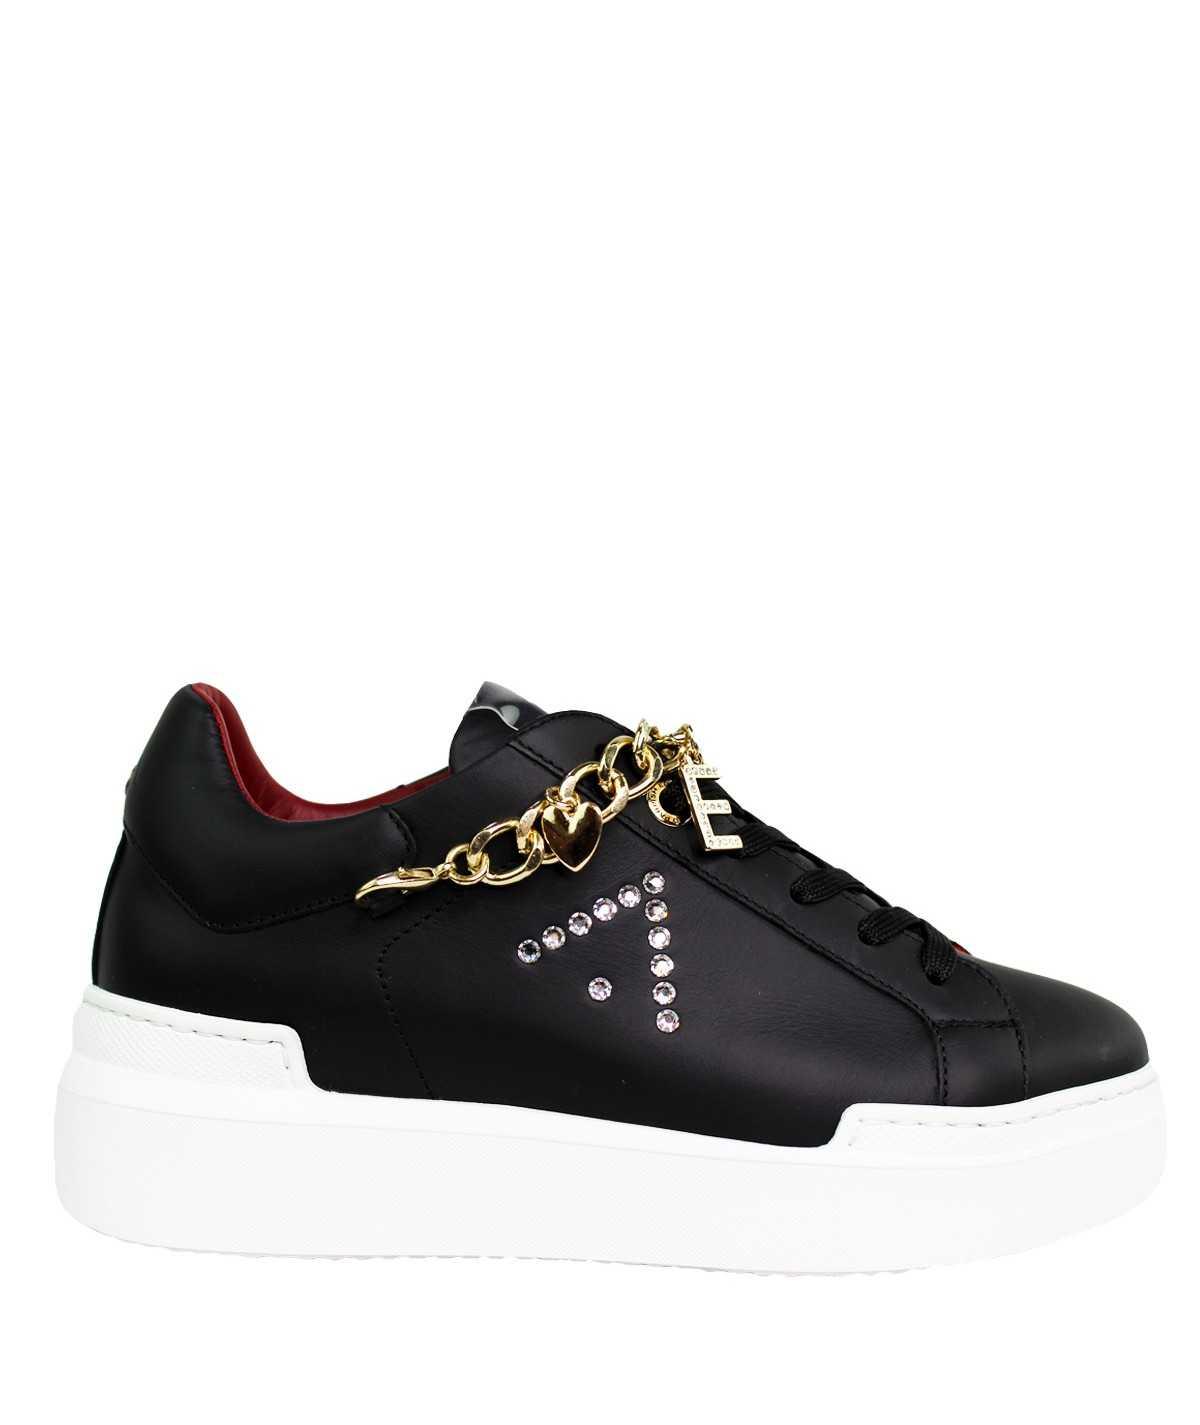 ED PARRISH Sneakers...